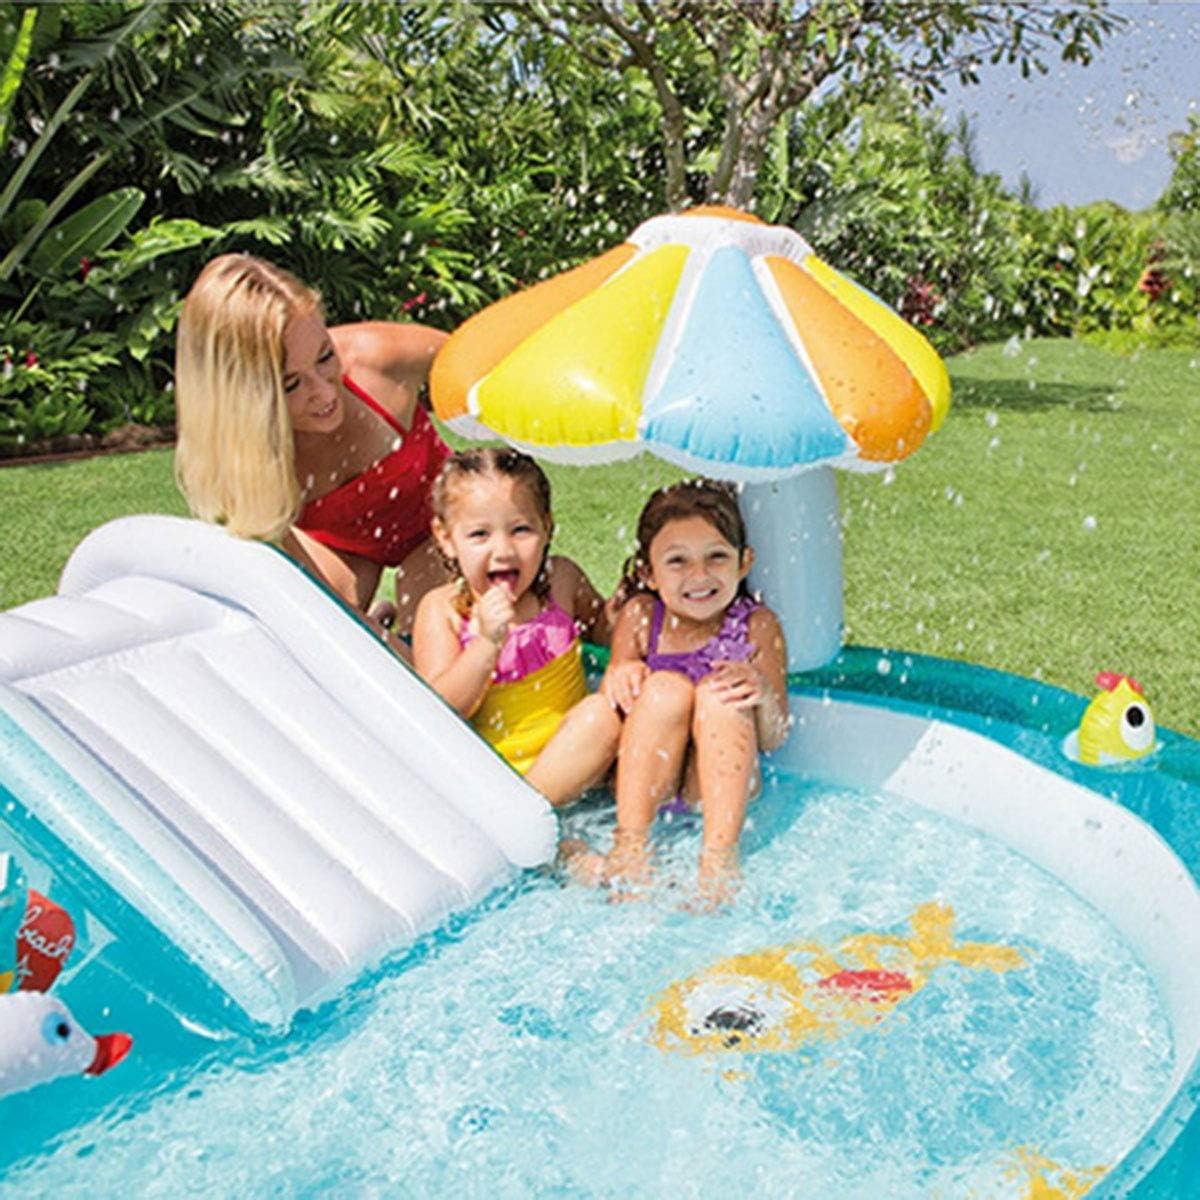 Piscina para bebés,Piscina inflable de chorros de agua con tobogán de cocodrilo, piscina infantil, piscina de arena para bebés piscina de bolas marinas, regalos-203 × 173 × 89CM